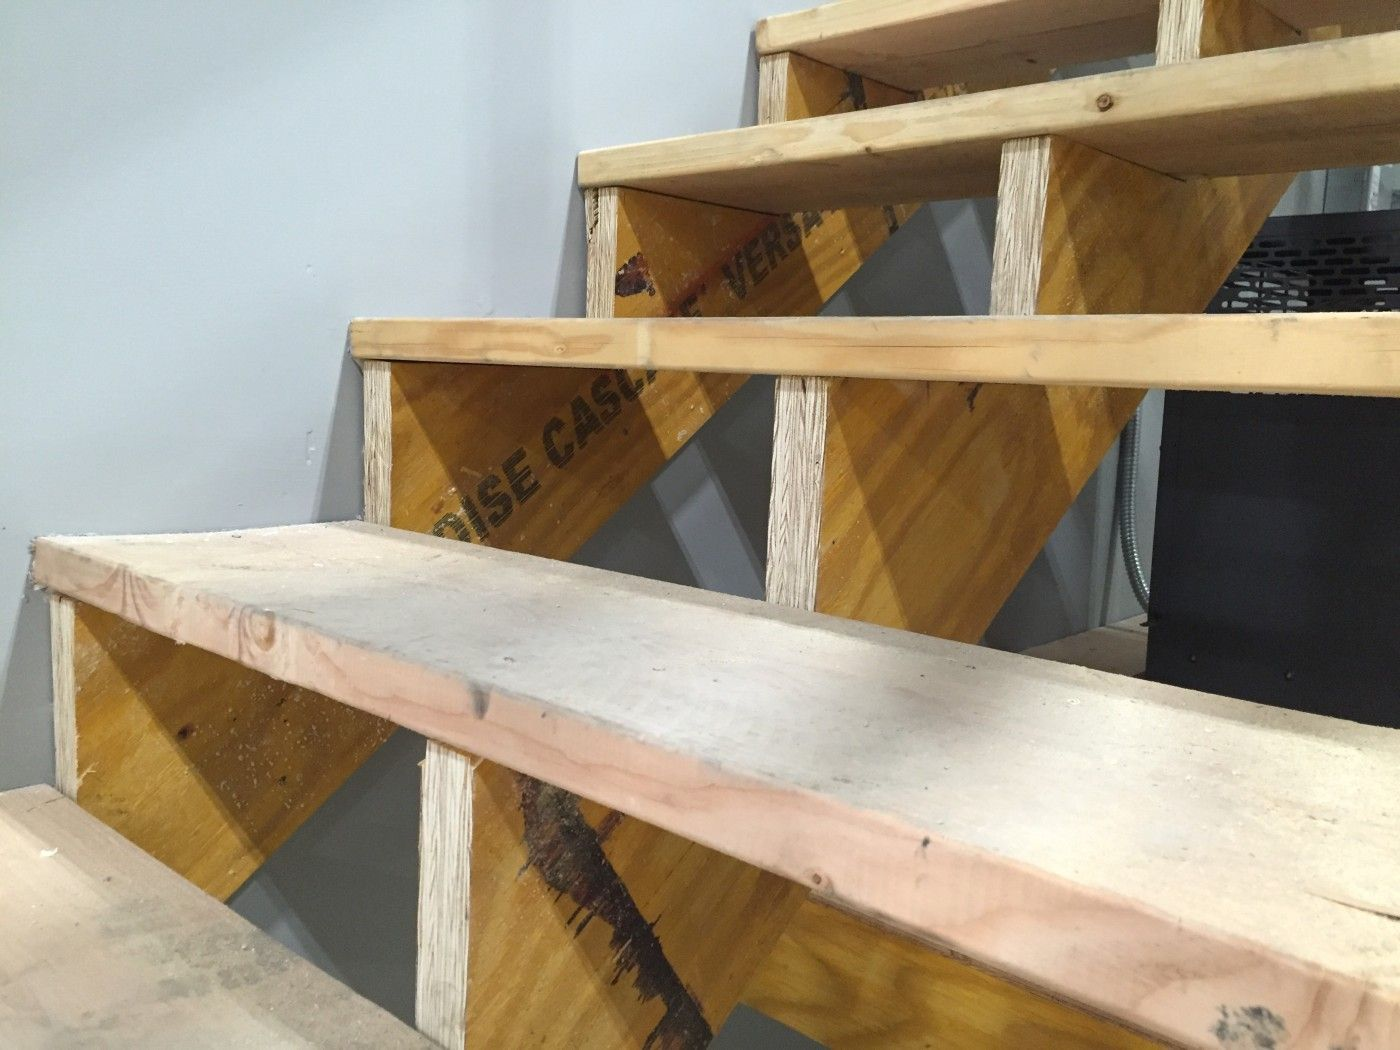 Best Boise Cascade Engineered Wood Lvl For Custom Made Stair 400 x 300